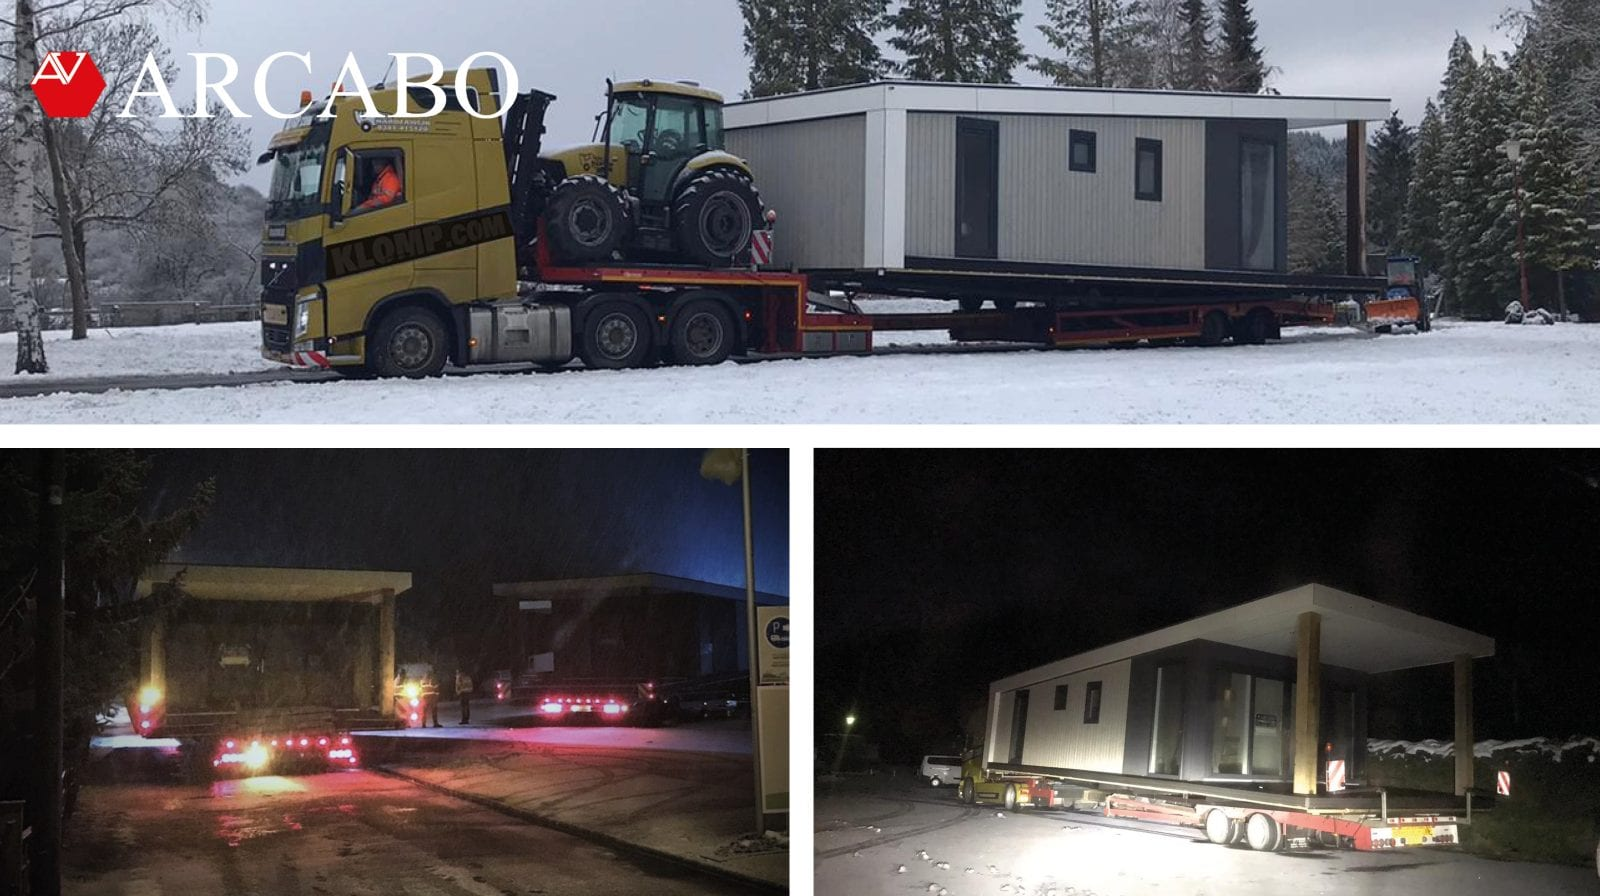 transport through the snow!